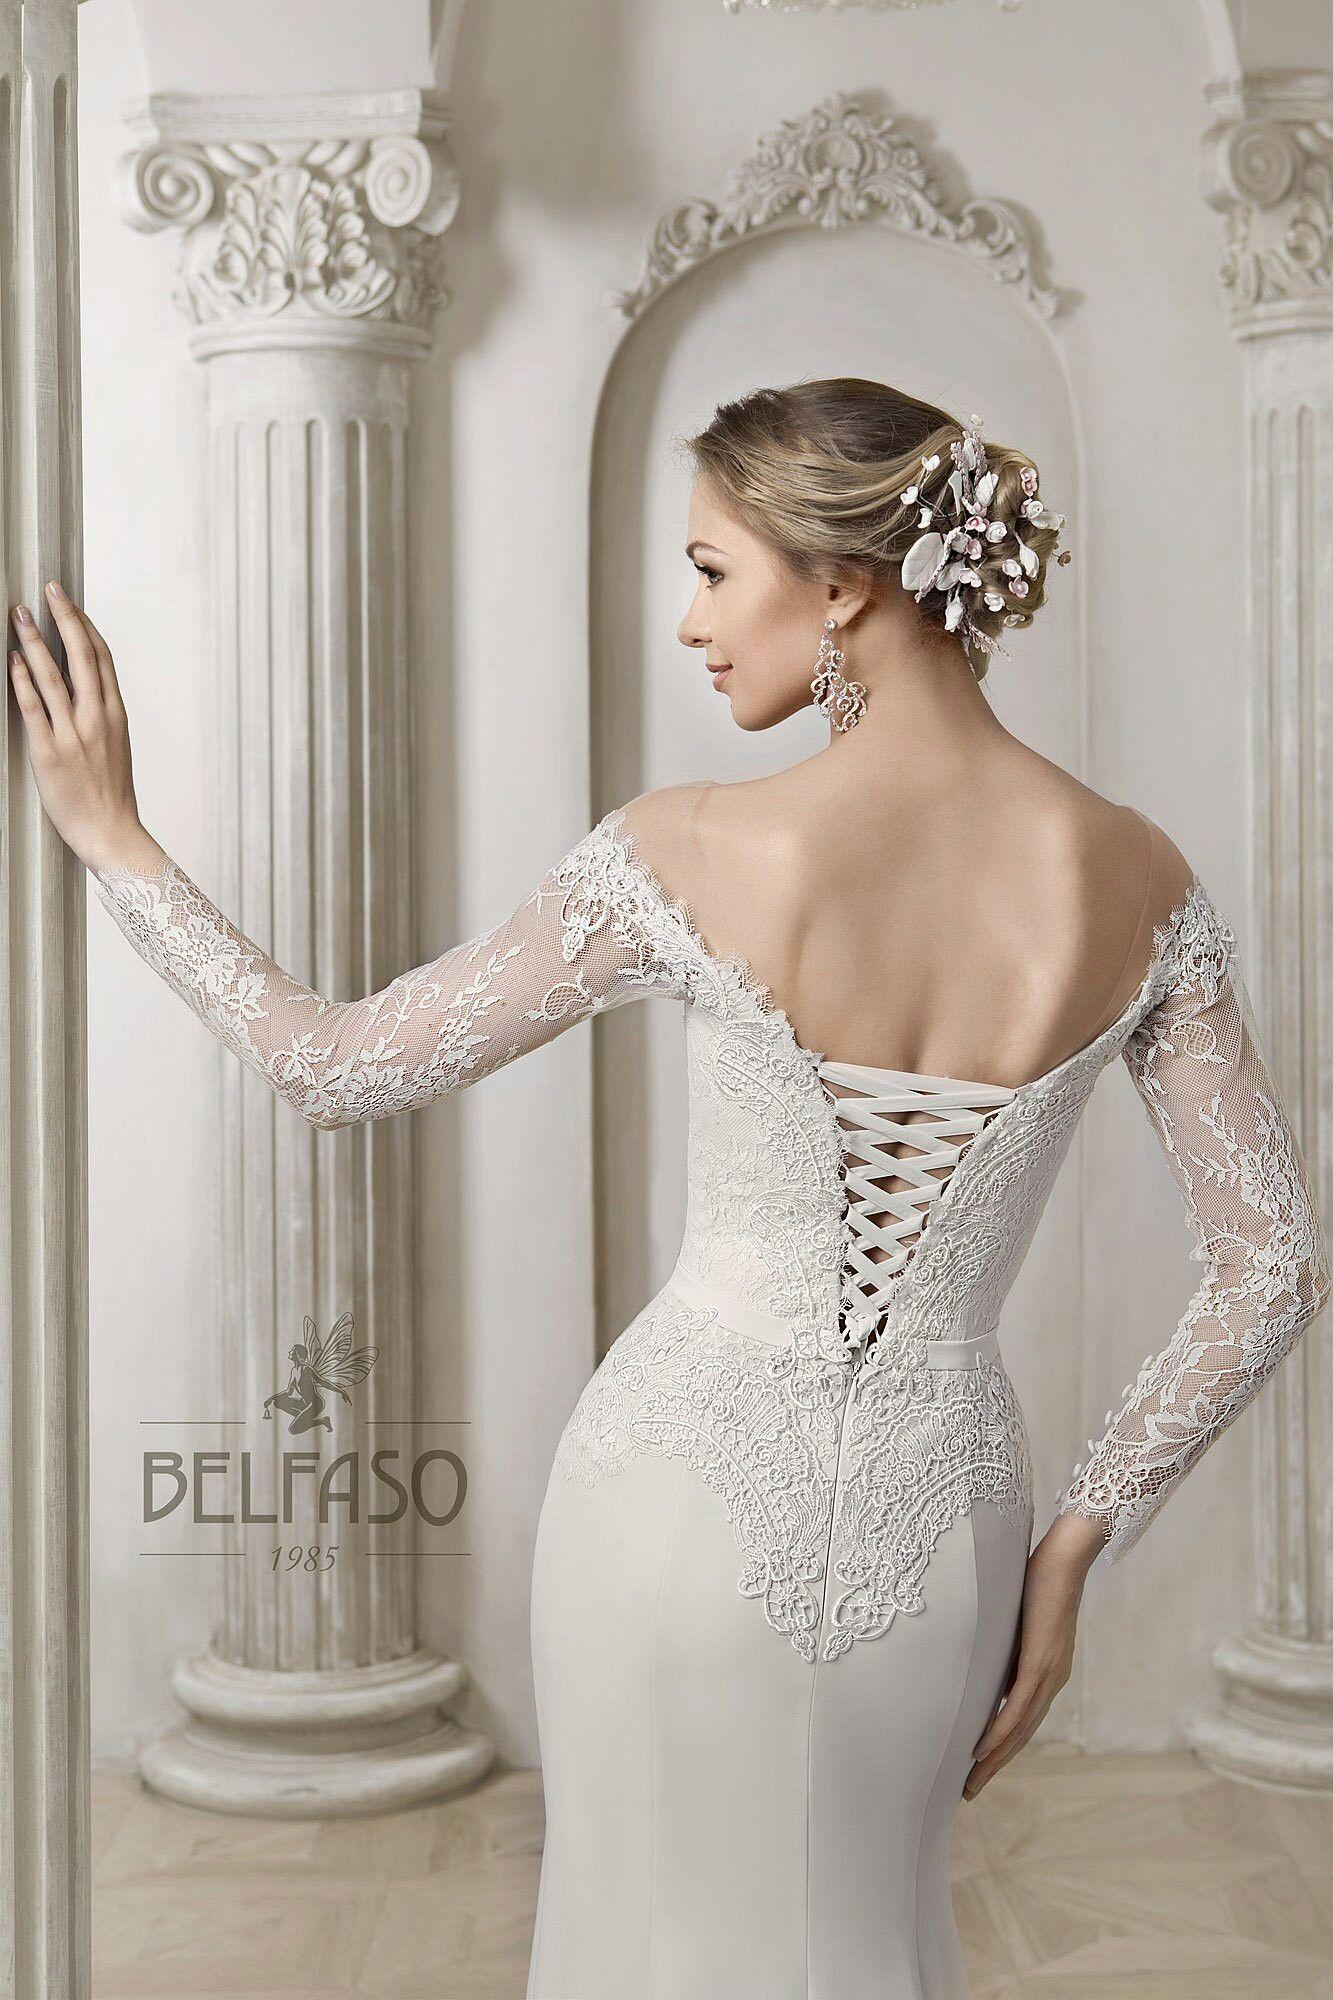 27 dresses wedding dress  Pin by Vanda Desiree on Wedding dresses  Pinterest